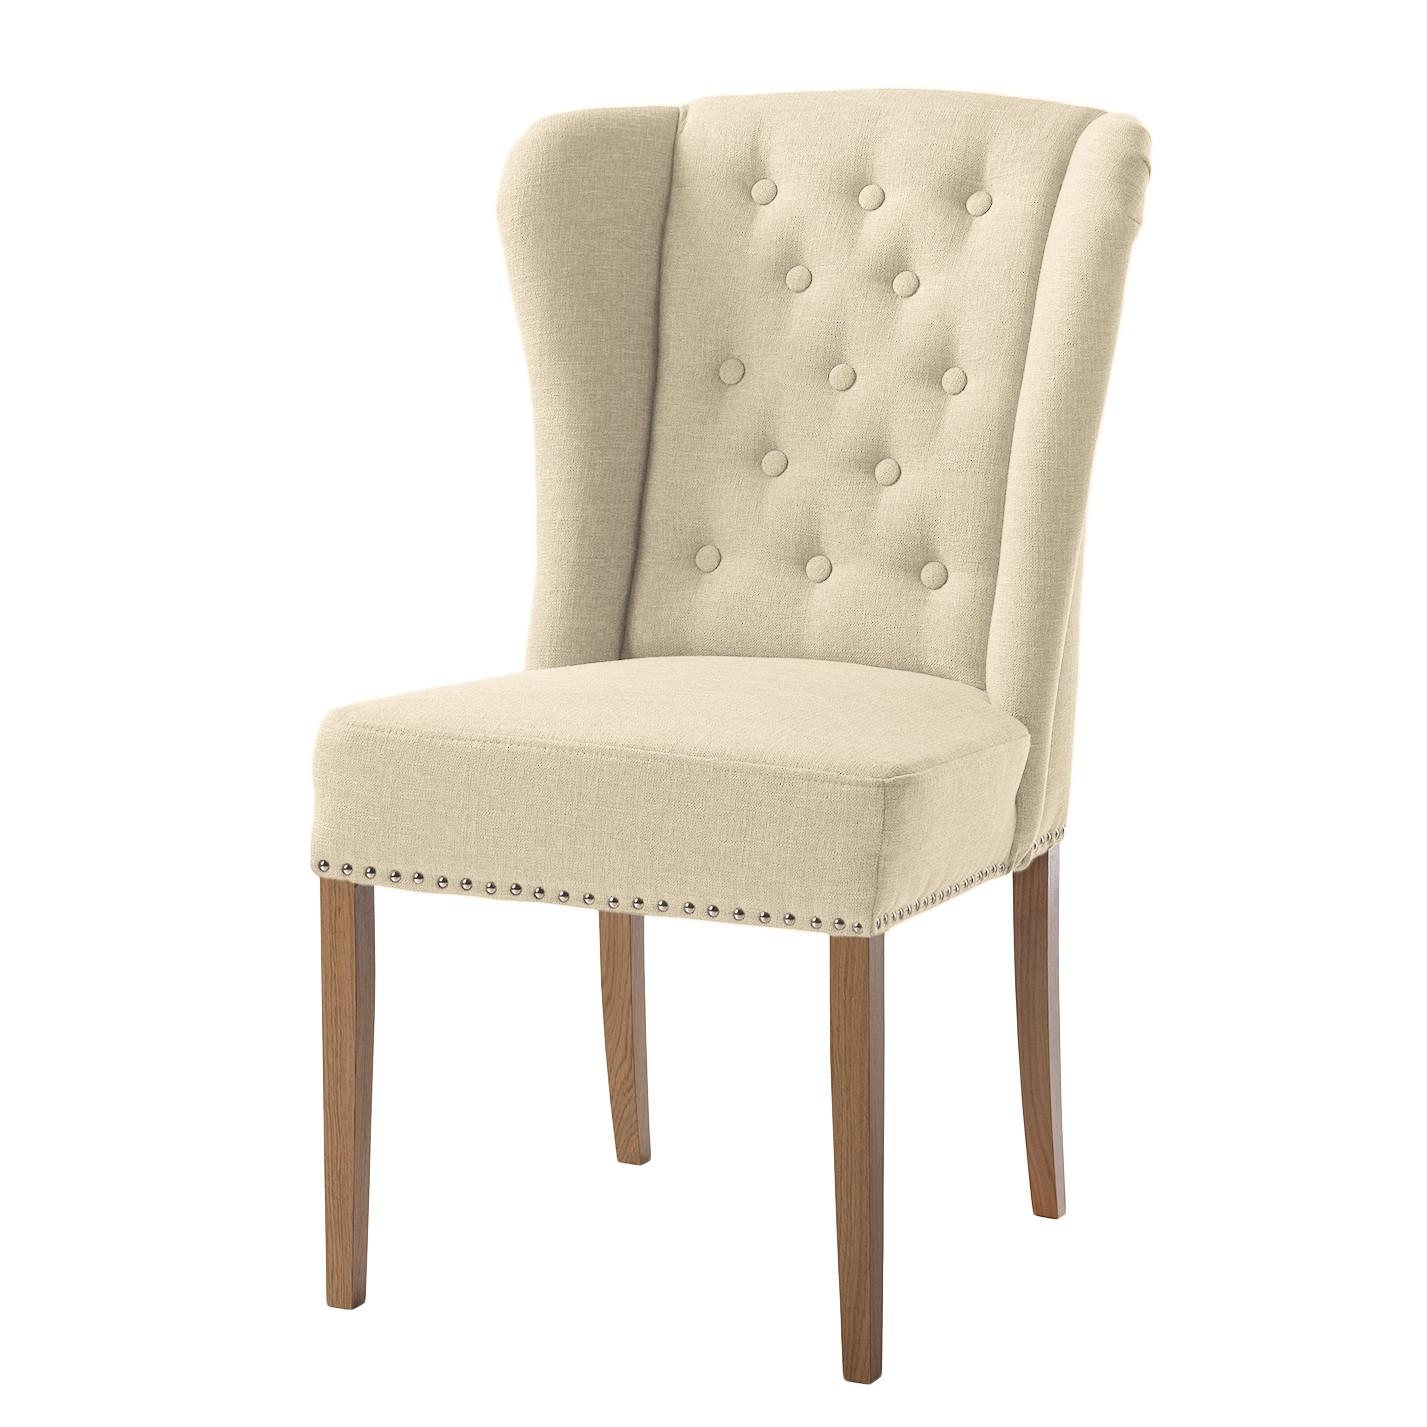 Maison belfort chaise lerona tissu h tre massif for Chaise de calvin